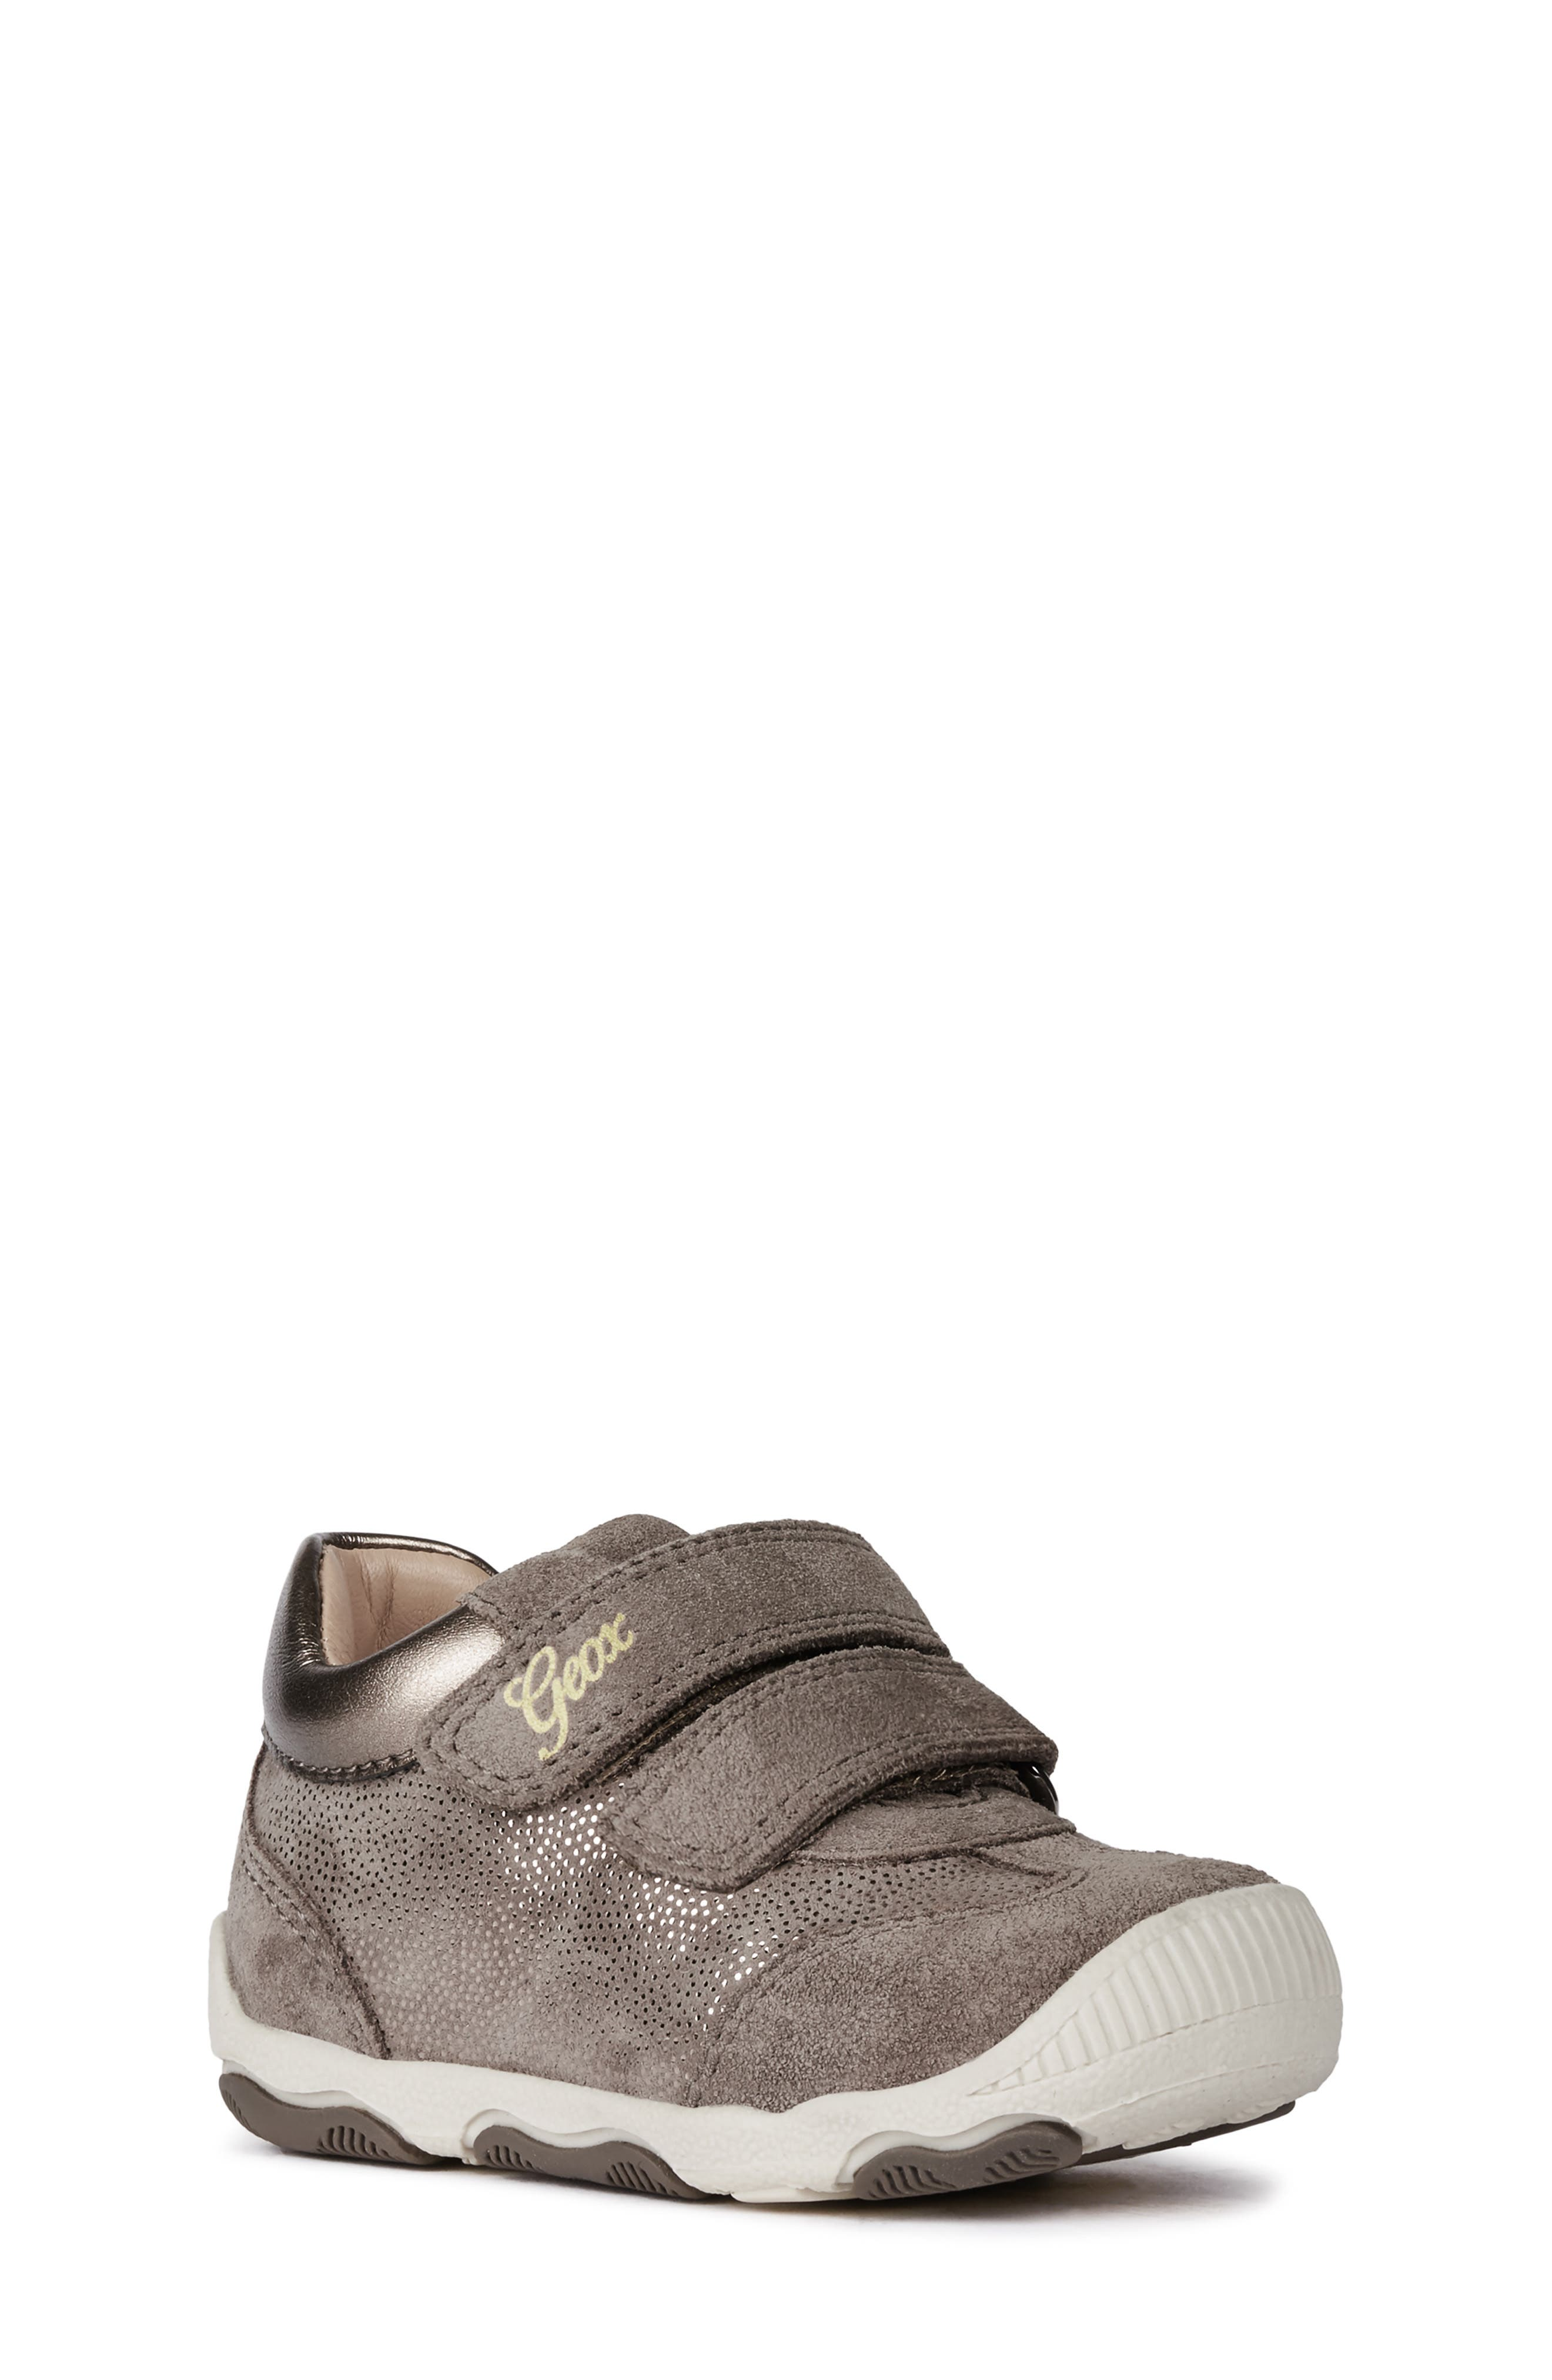 Balu Sneaker,                             Main thumbnail 1, color,                             052